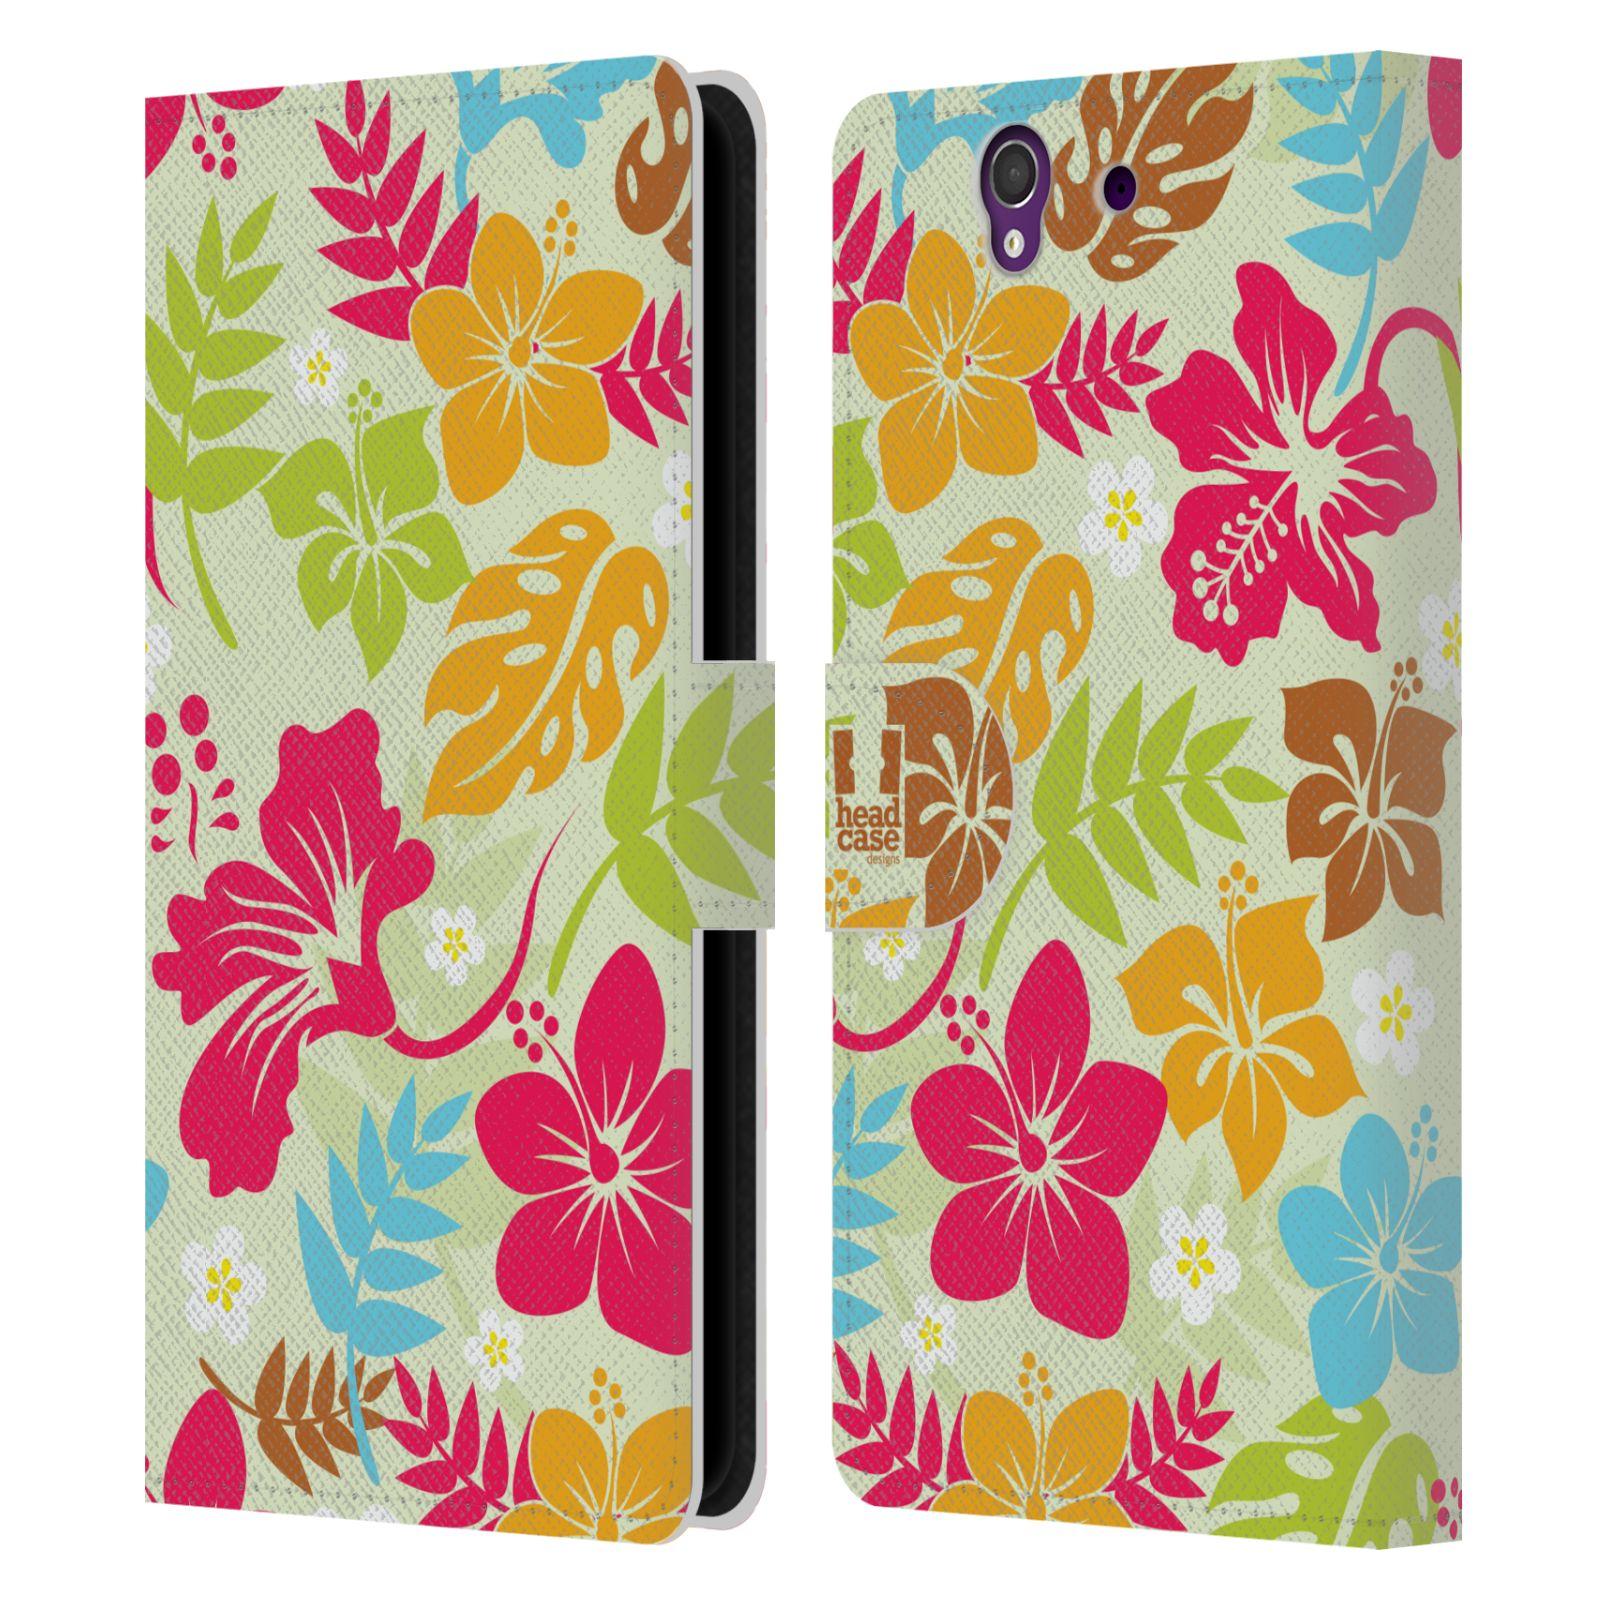 HEAD CASE Flipové pouzdro pro mobil SONY XPERIA Z (C6603) Havajský vzor barevné květy